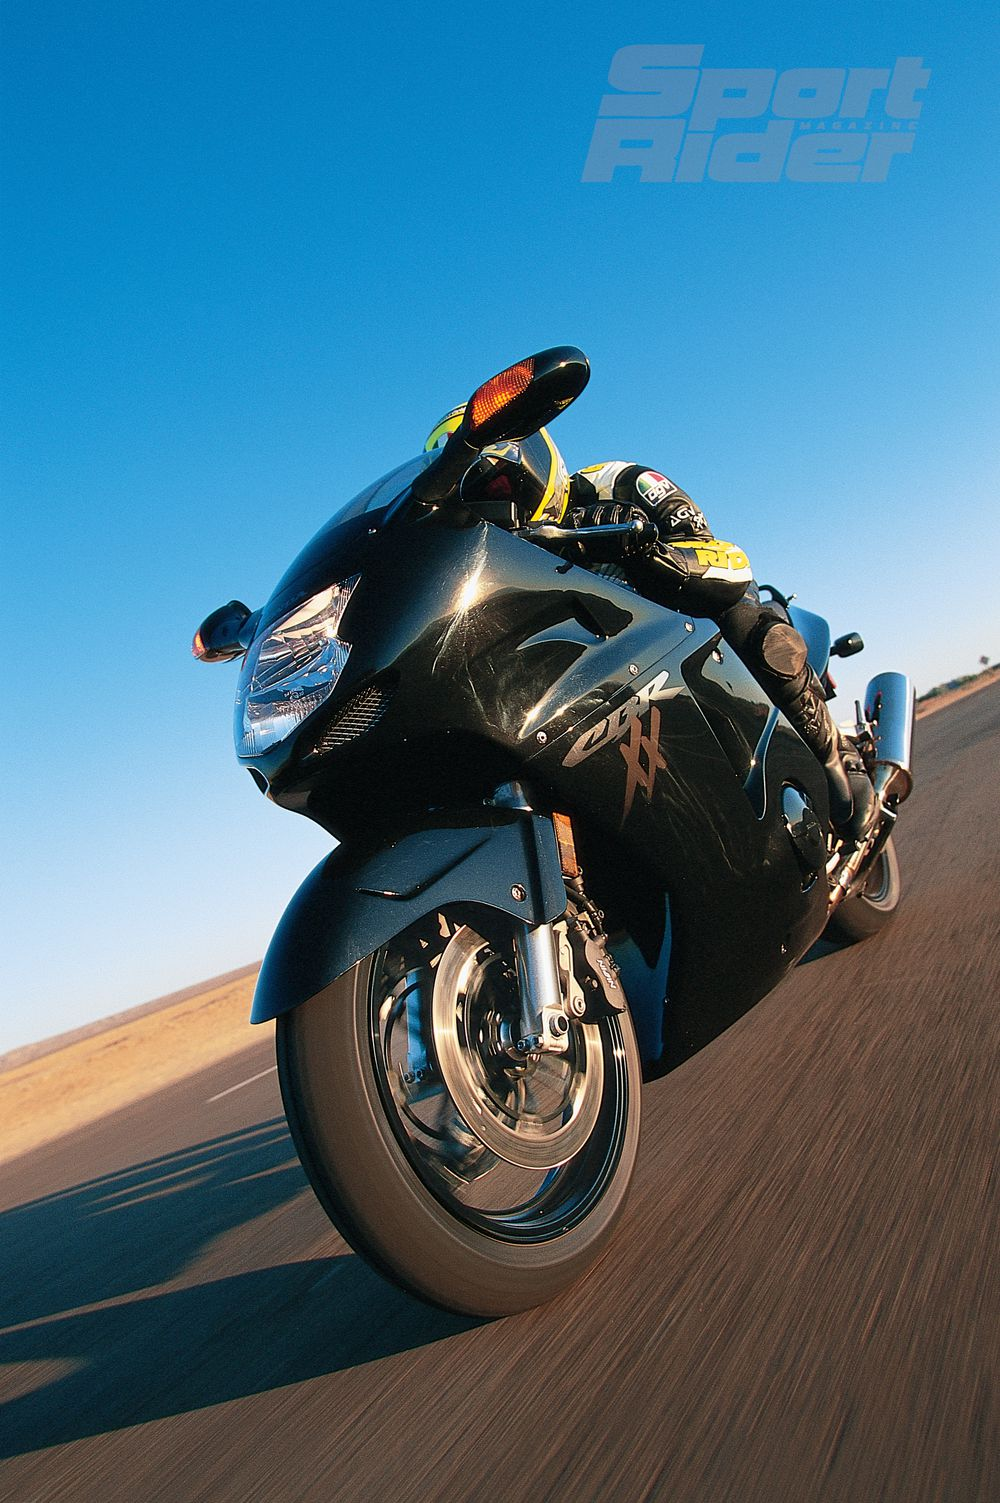 1997-2003 honda cbr1100xx - great sportbikes of the past